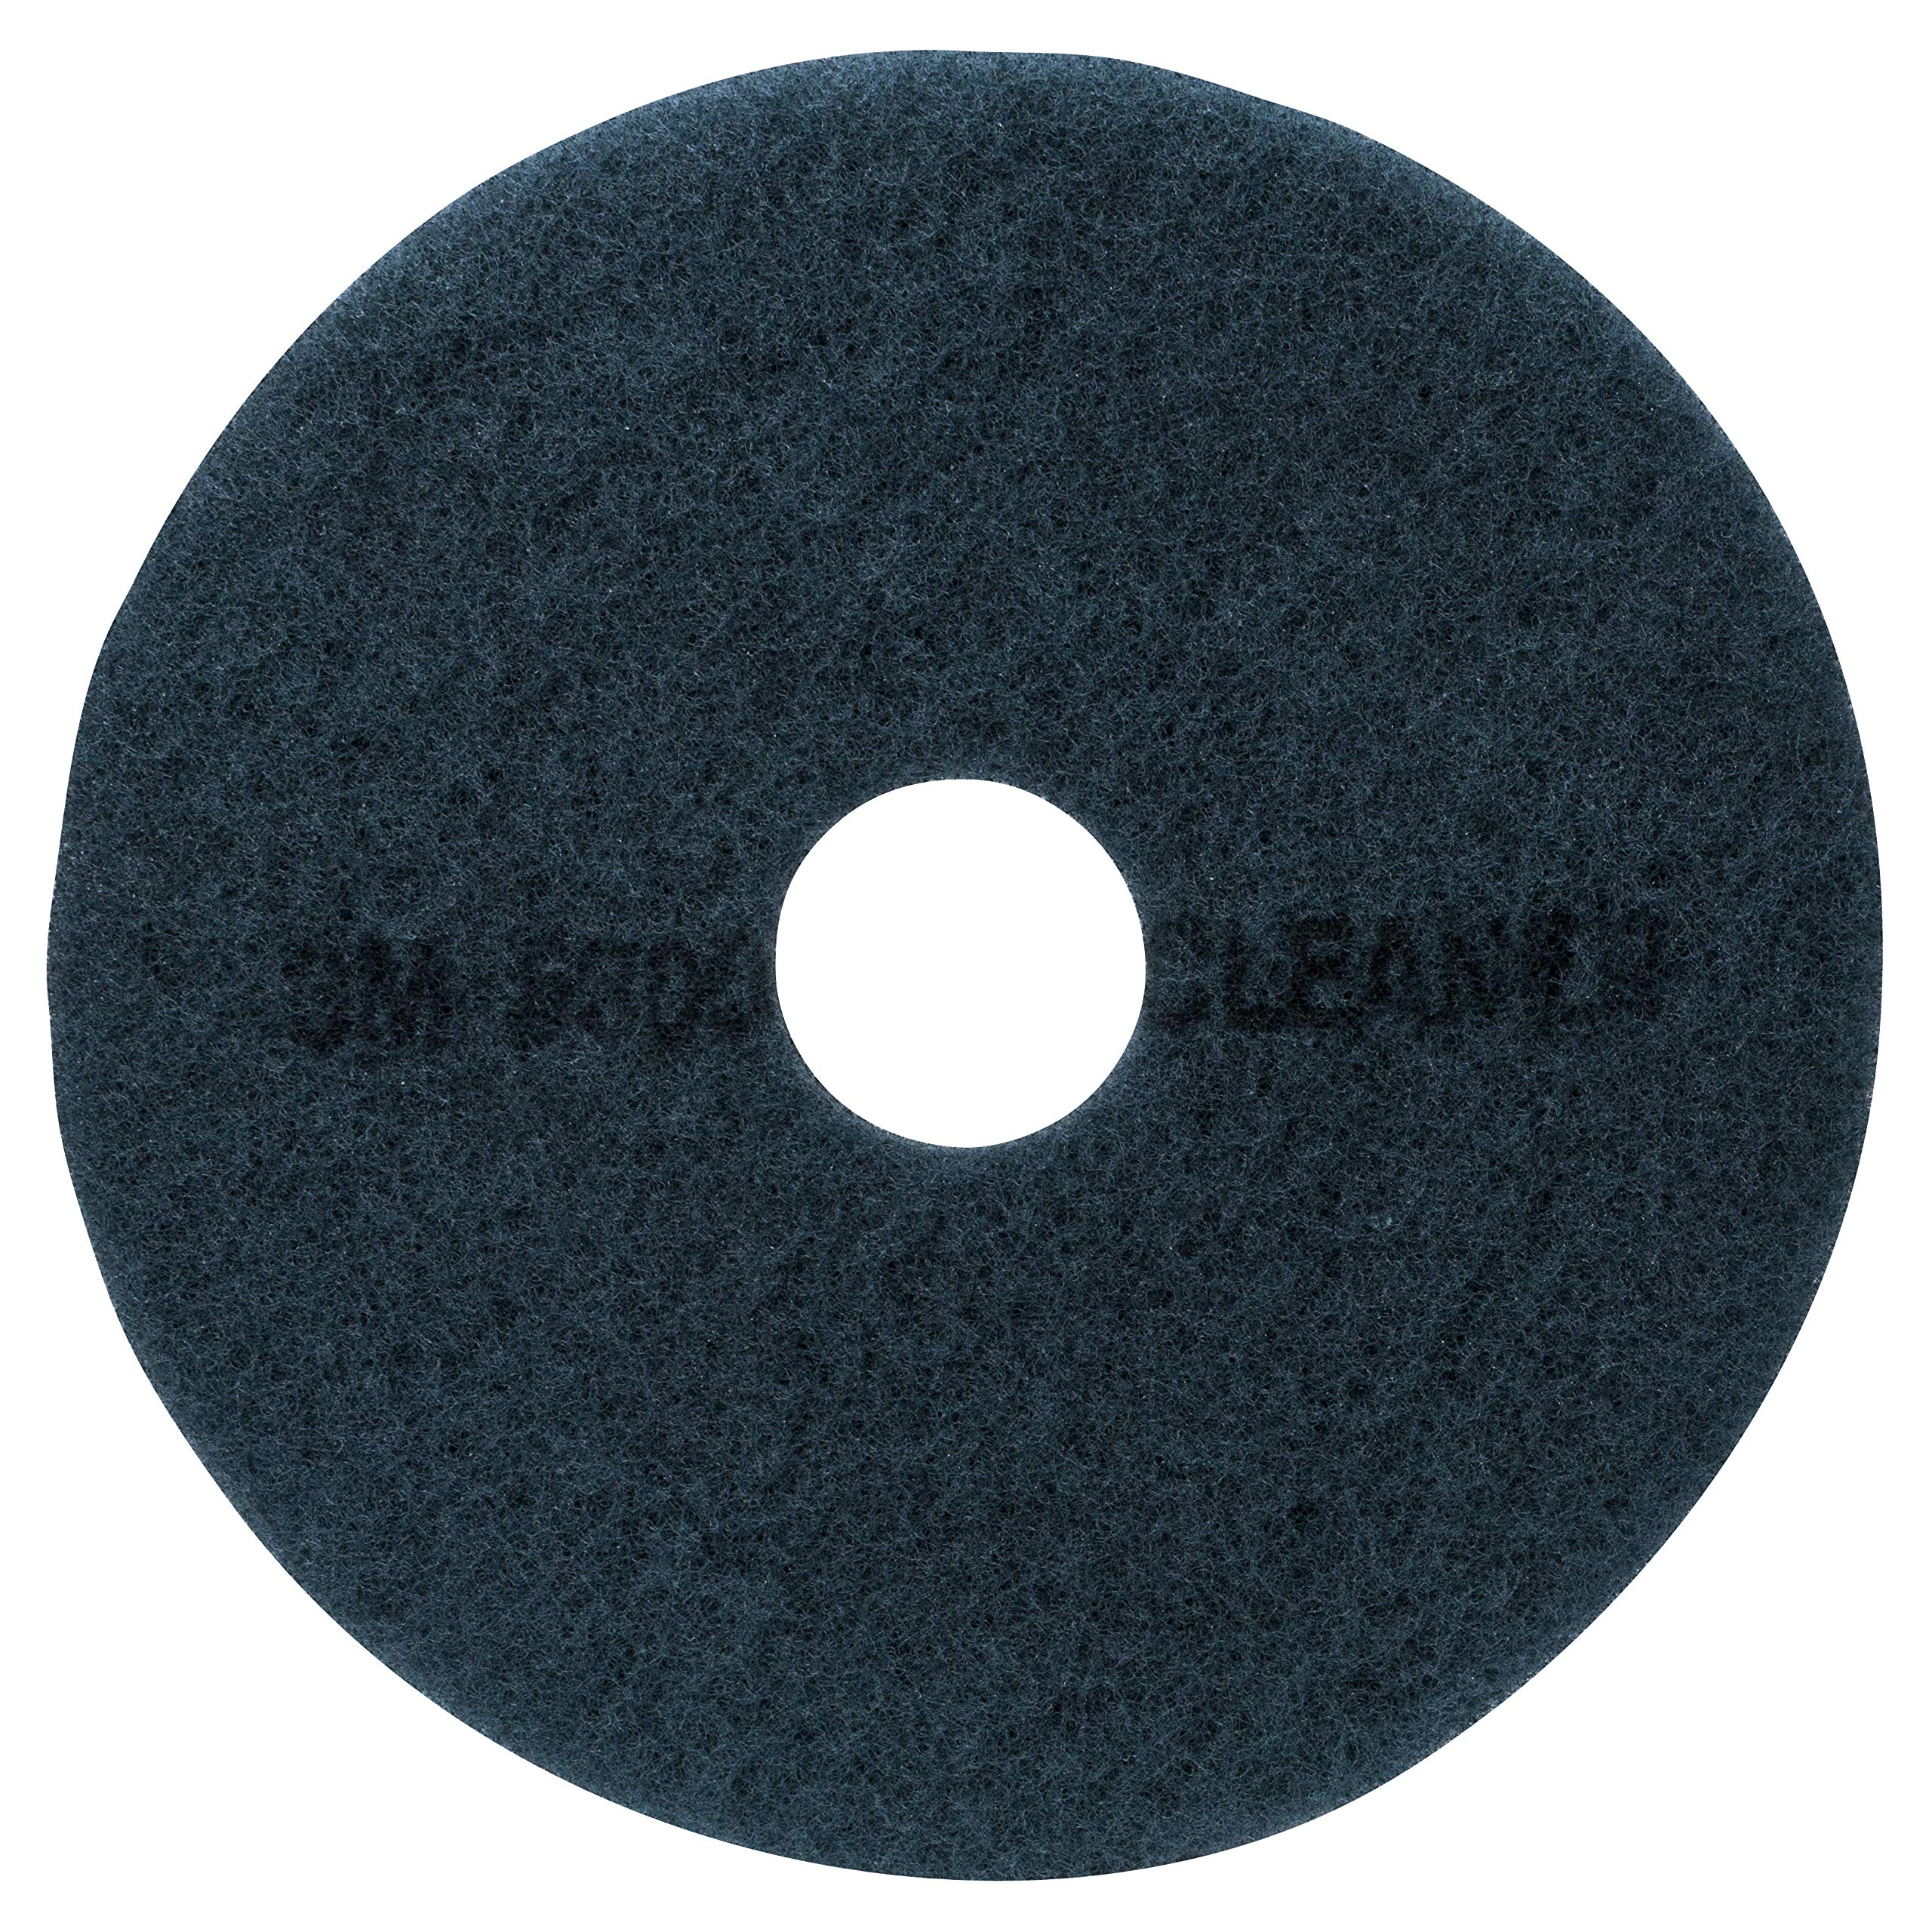 3M Blue Cleaner Pad 5300, 13'' Floor Care Pad (Case of 5)